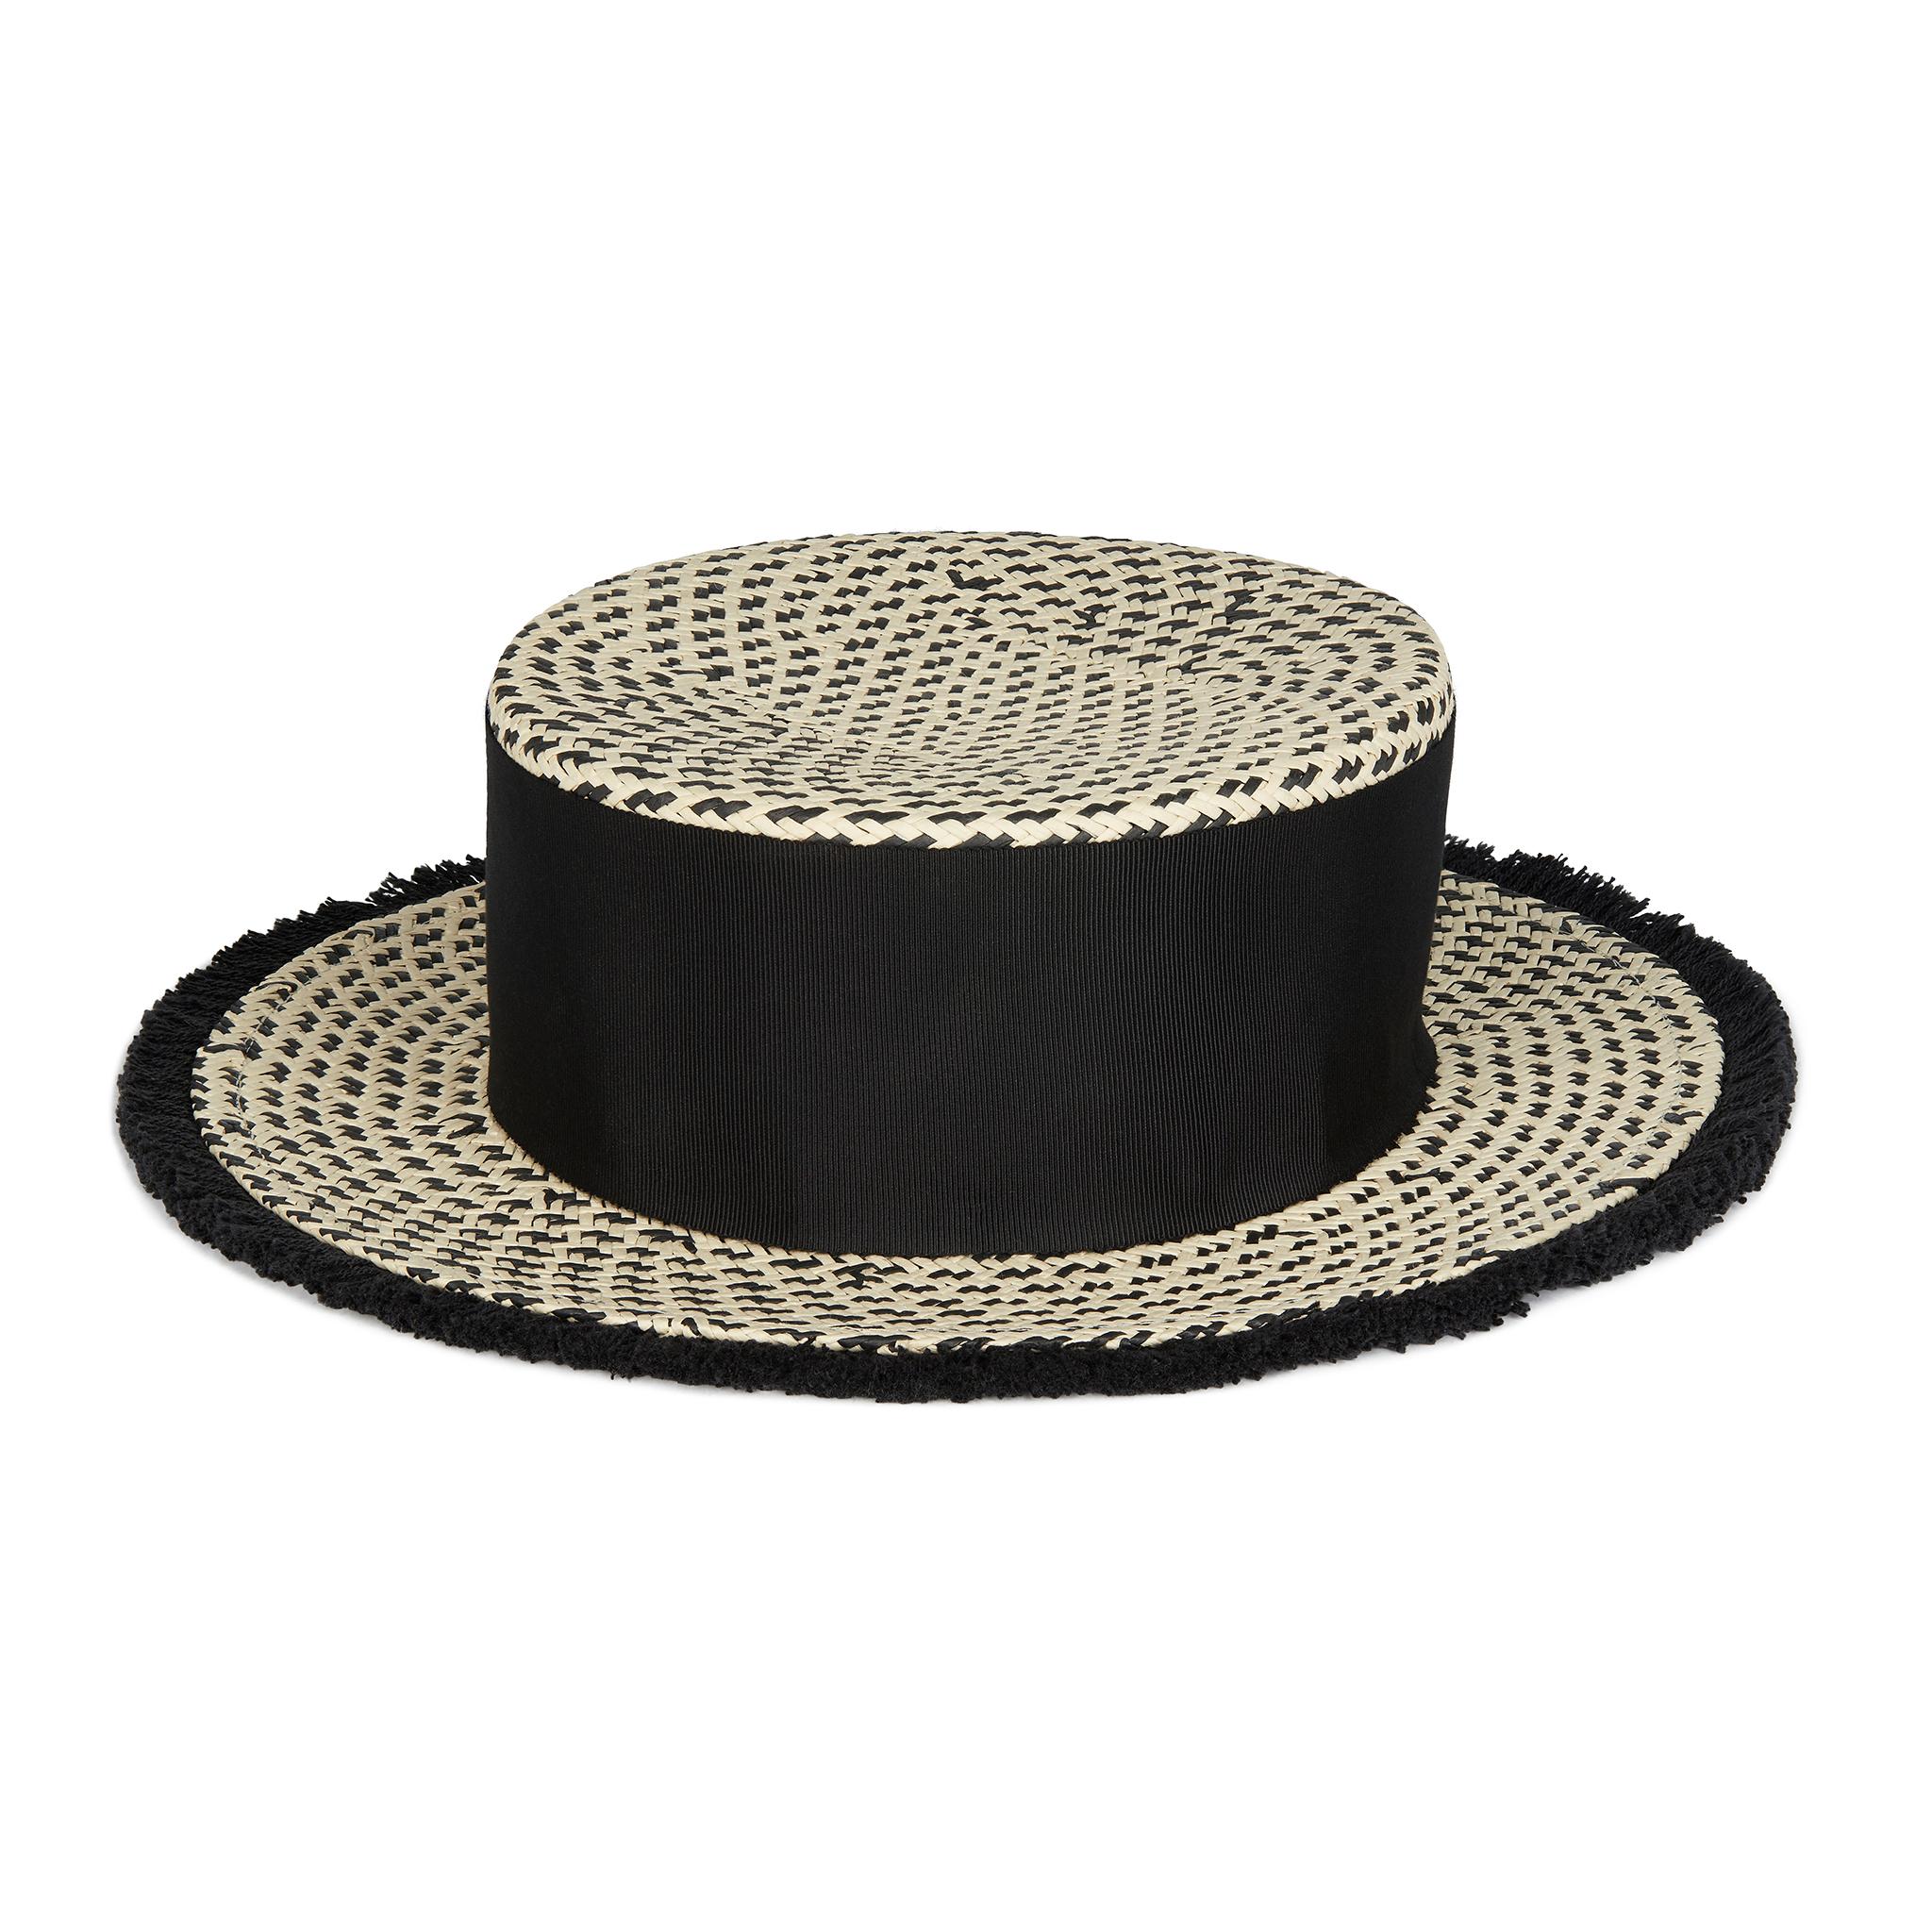 LRP-SM-Benoit-hats_09.jpg